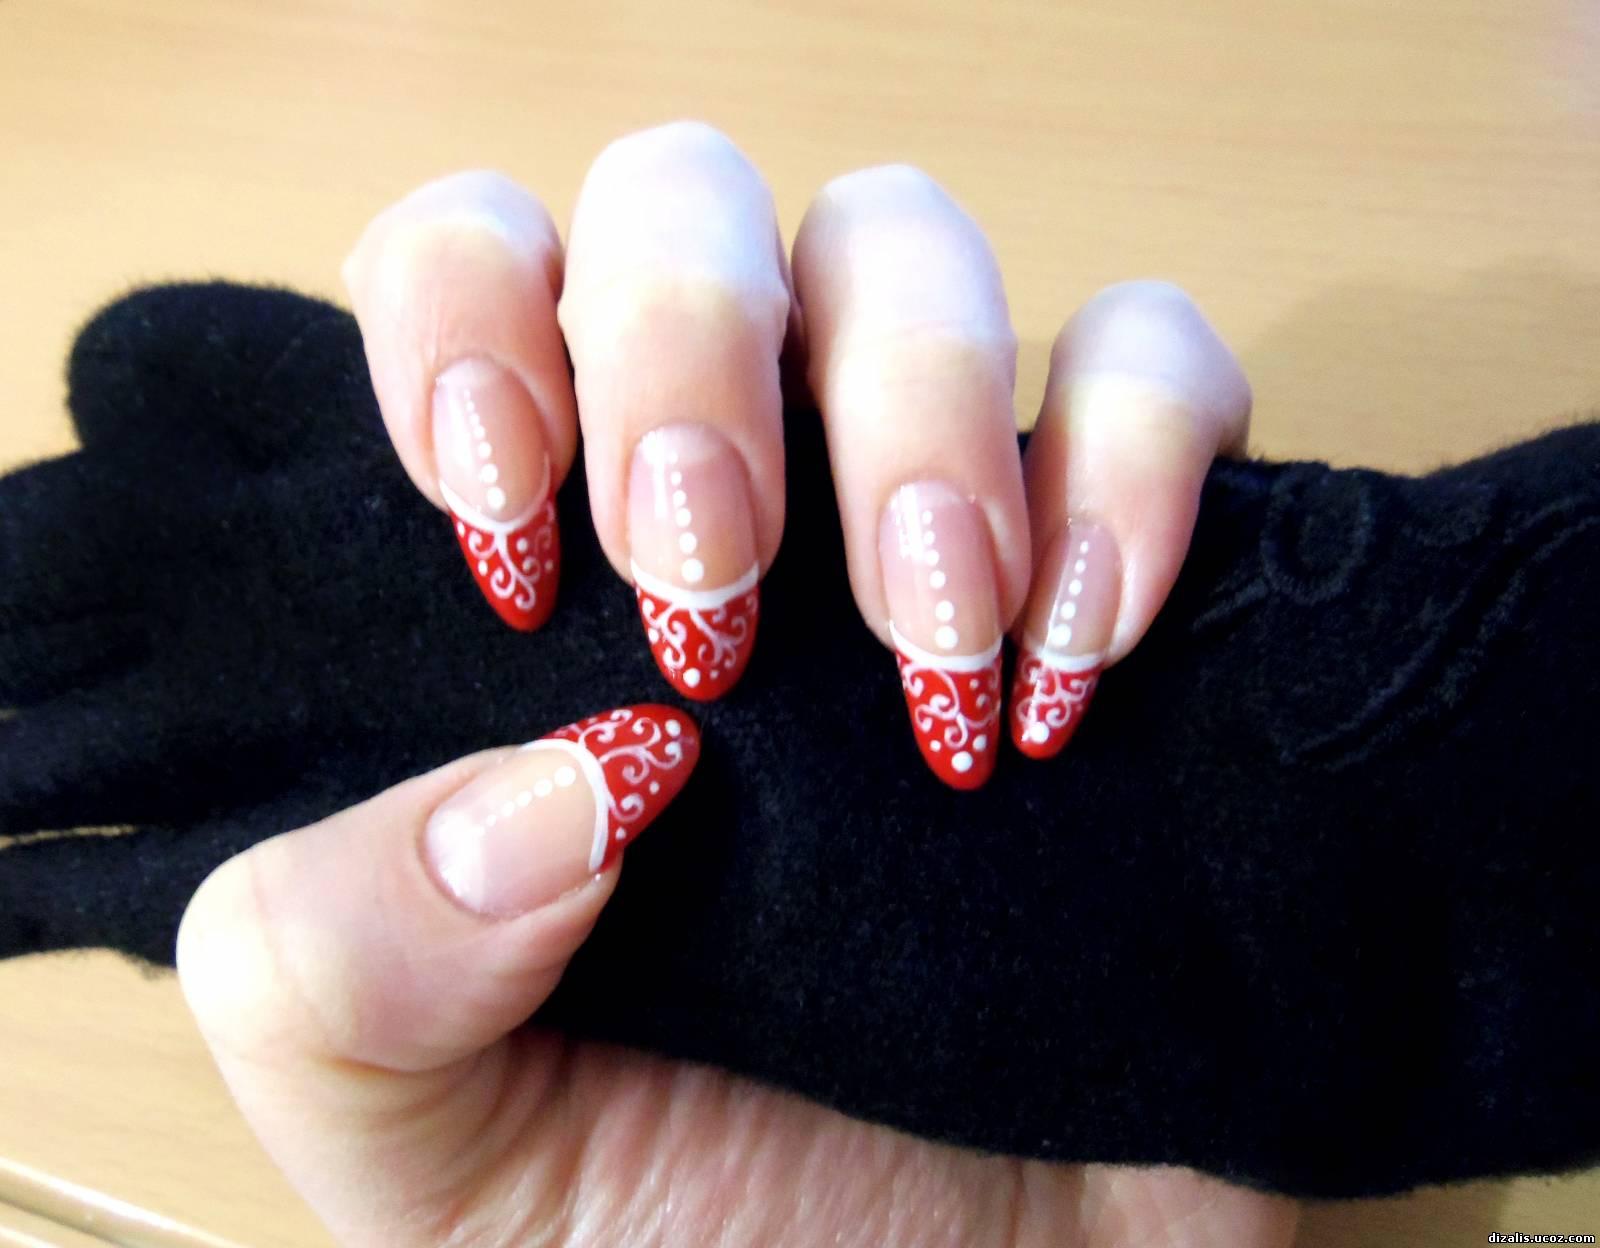 Фото ногтей с красно-белым рисунком